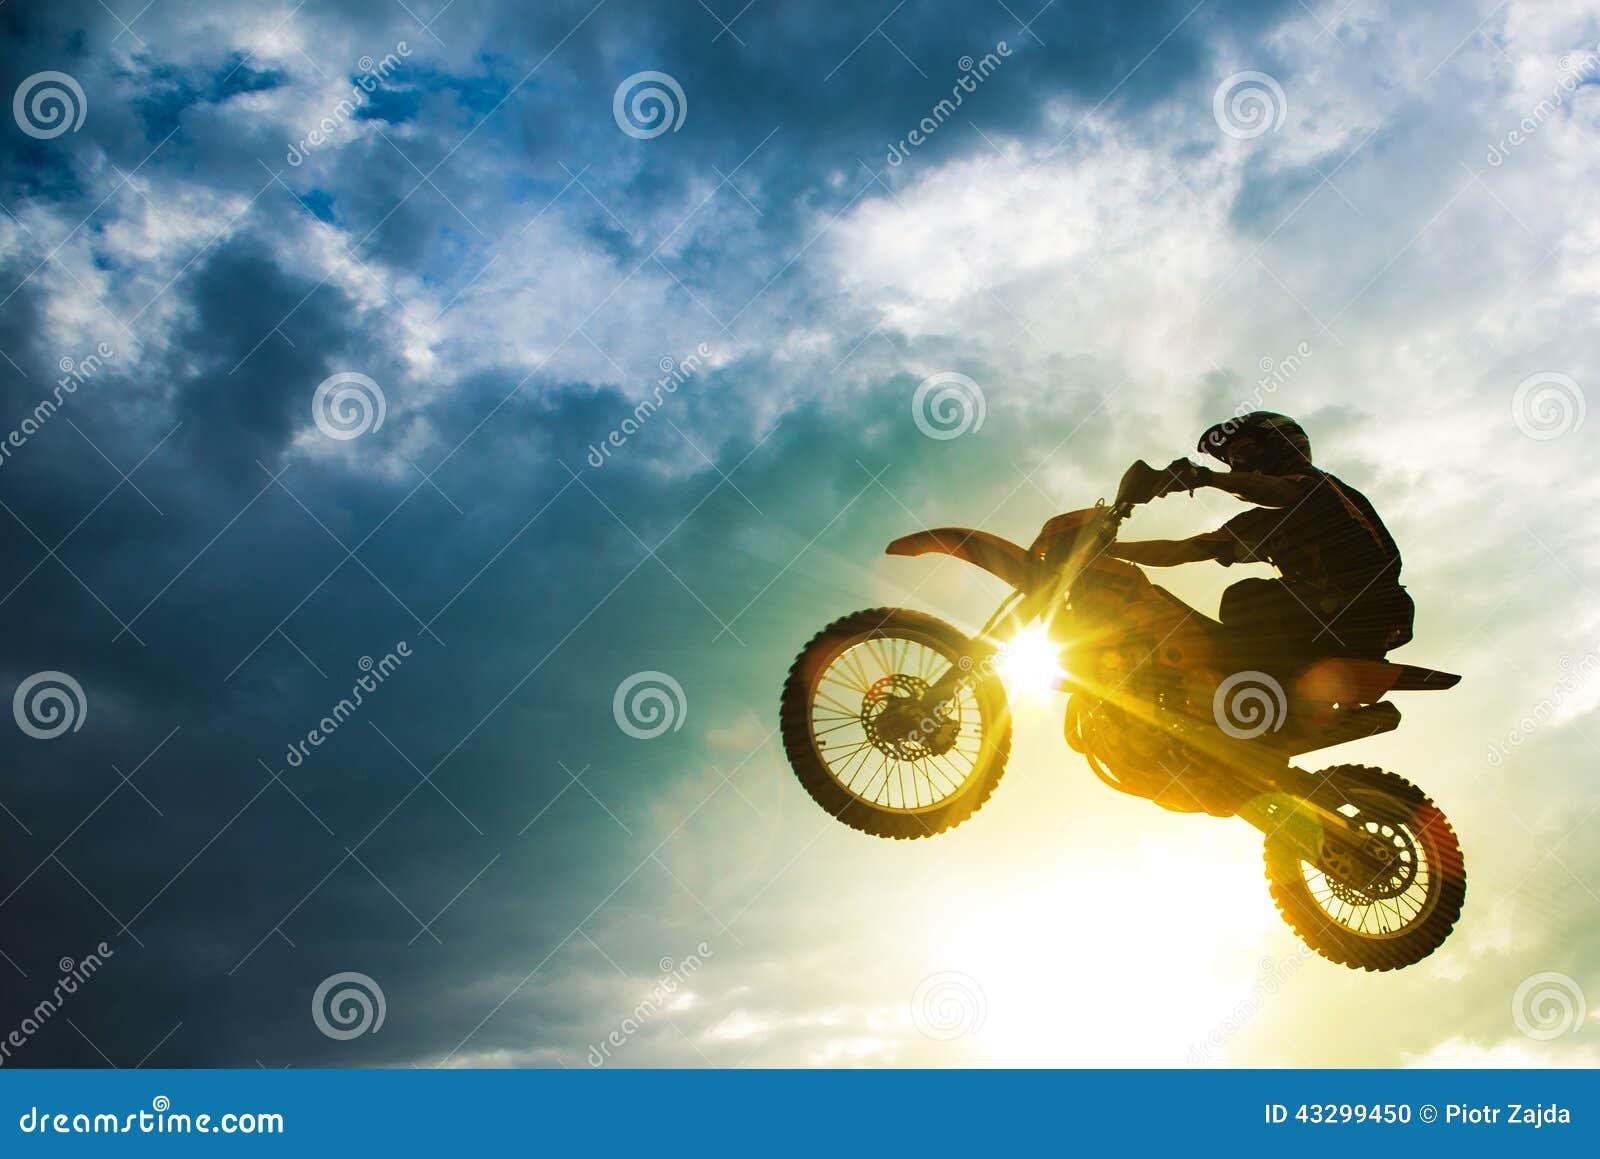 Saut de vélo de motocross